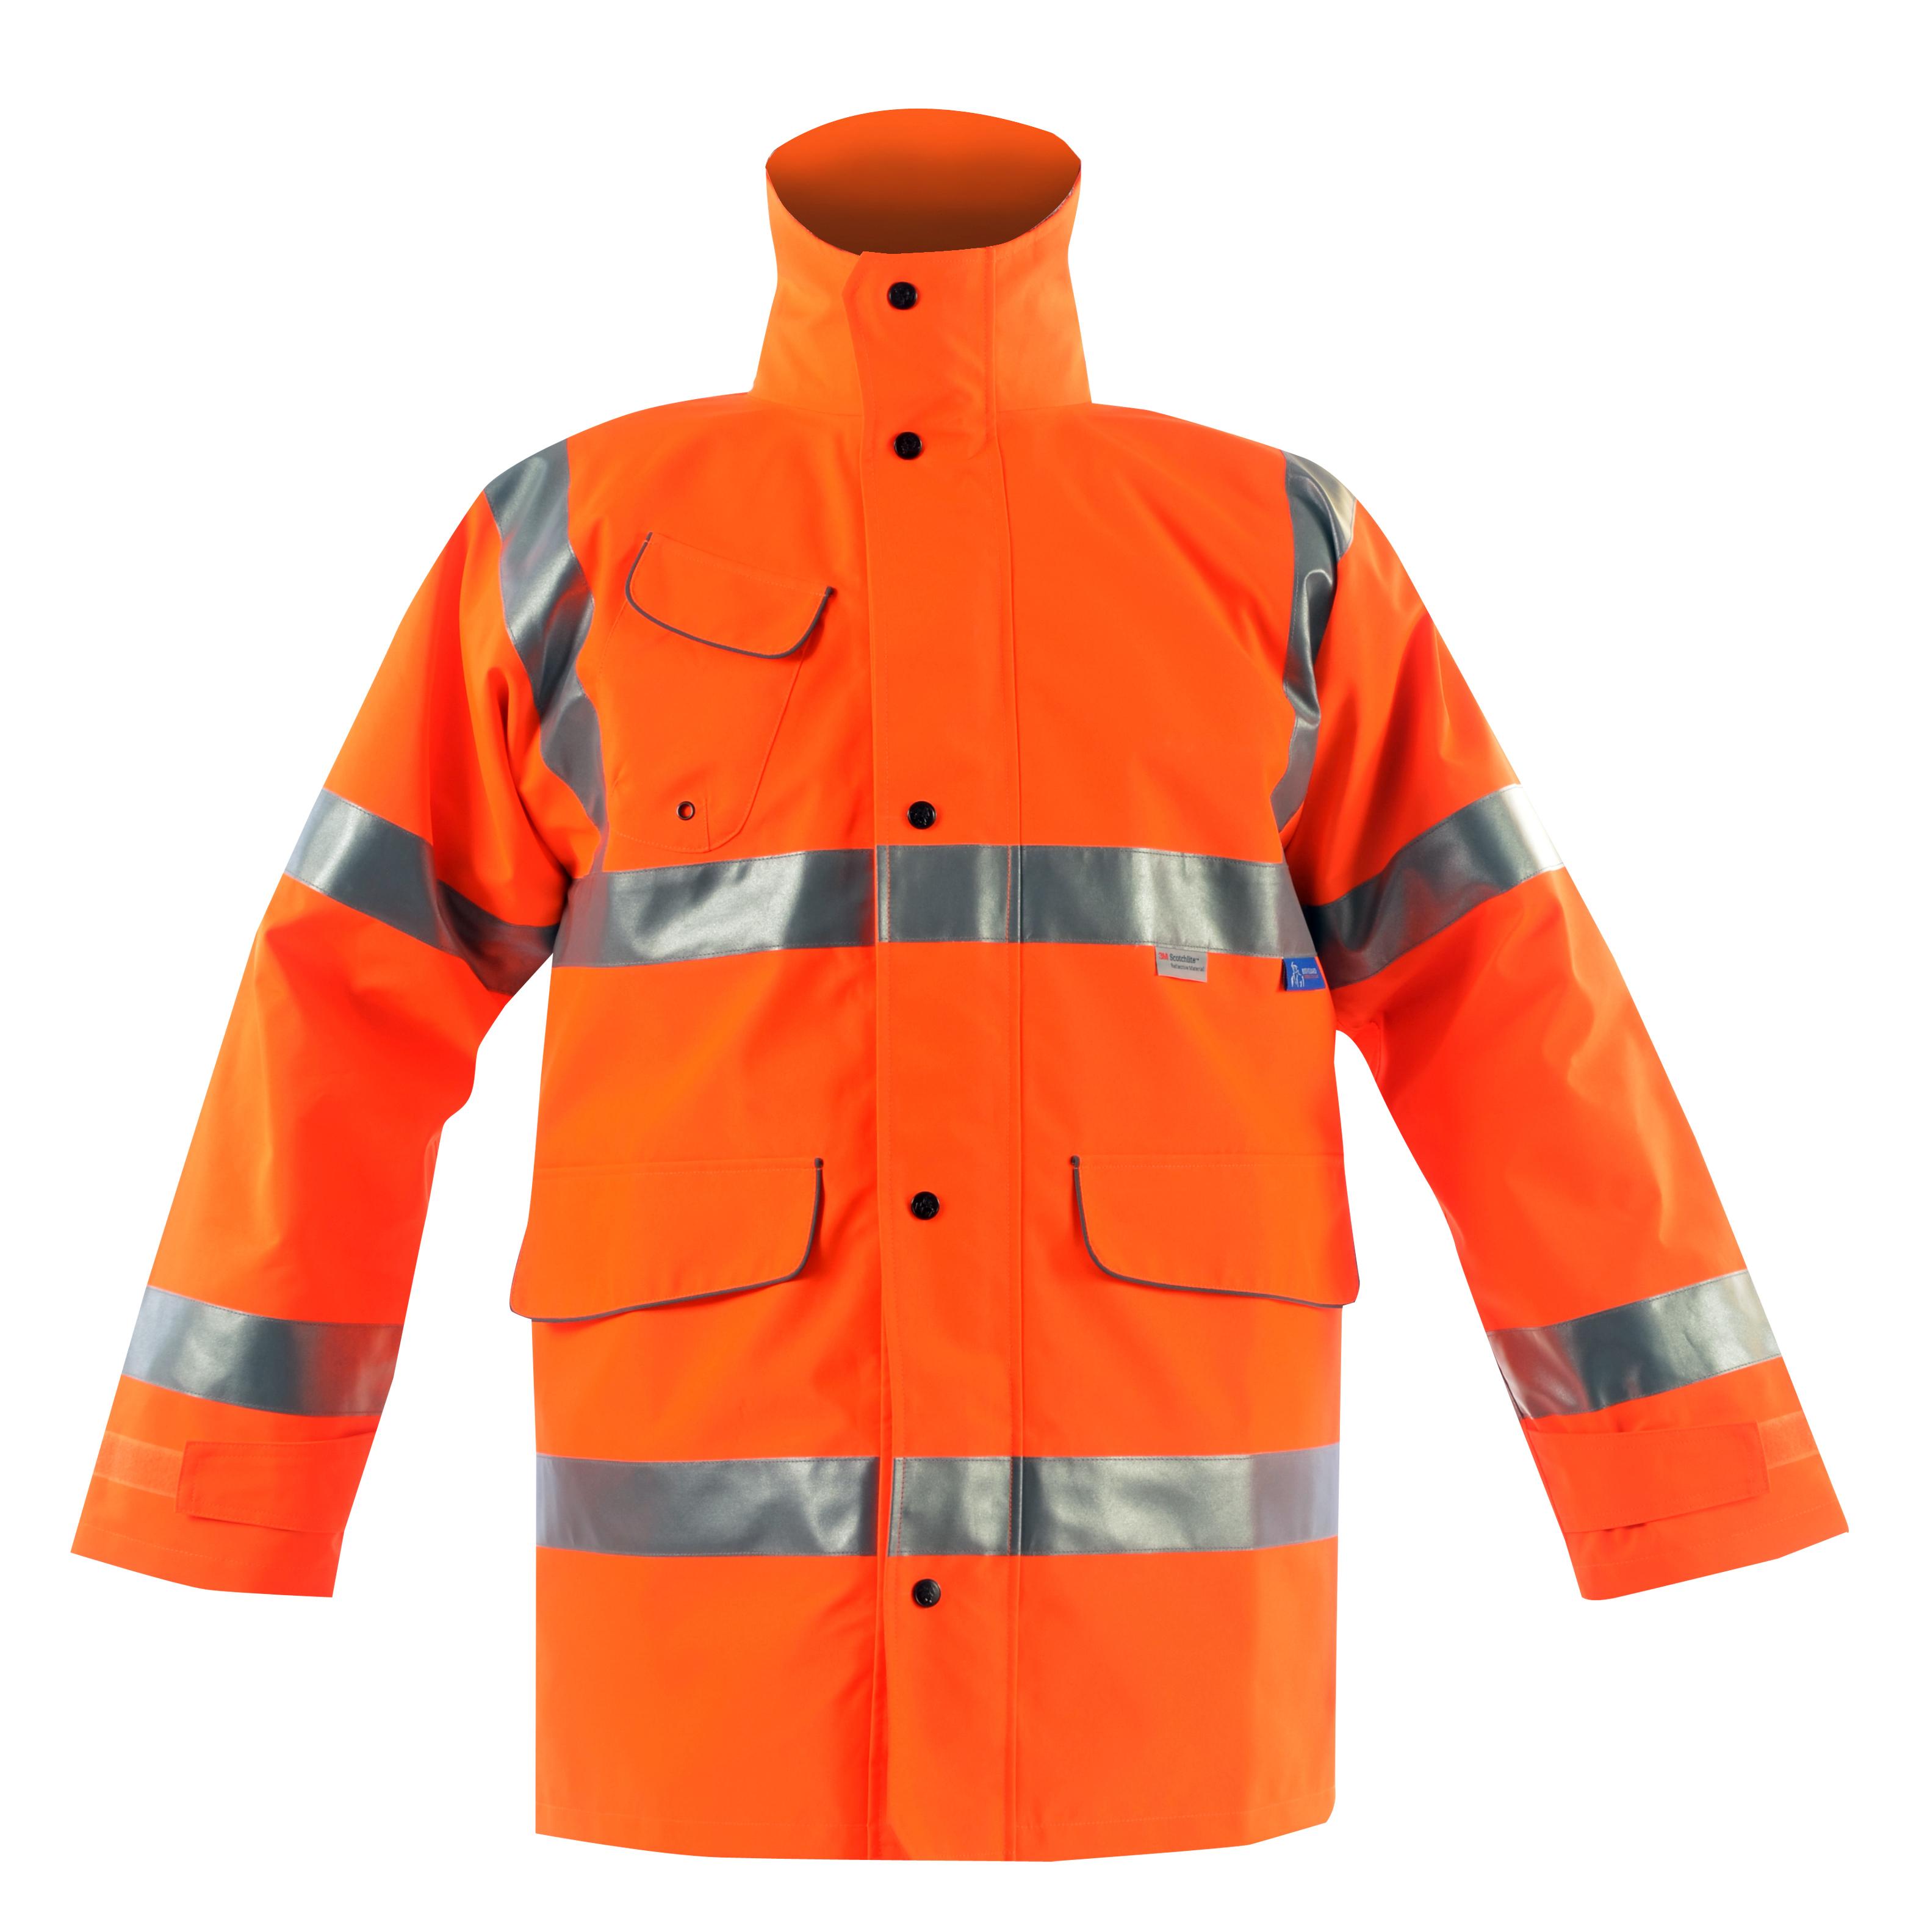 Vapourking Hi Vis Rail Storm Coat & Fleece Chin Guard